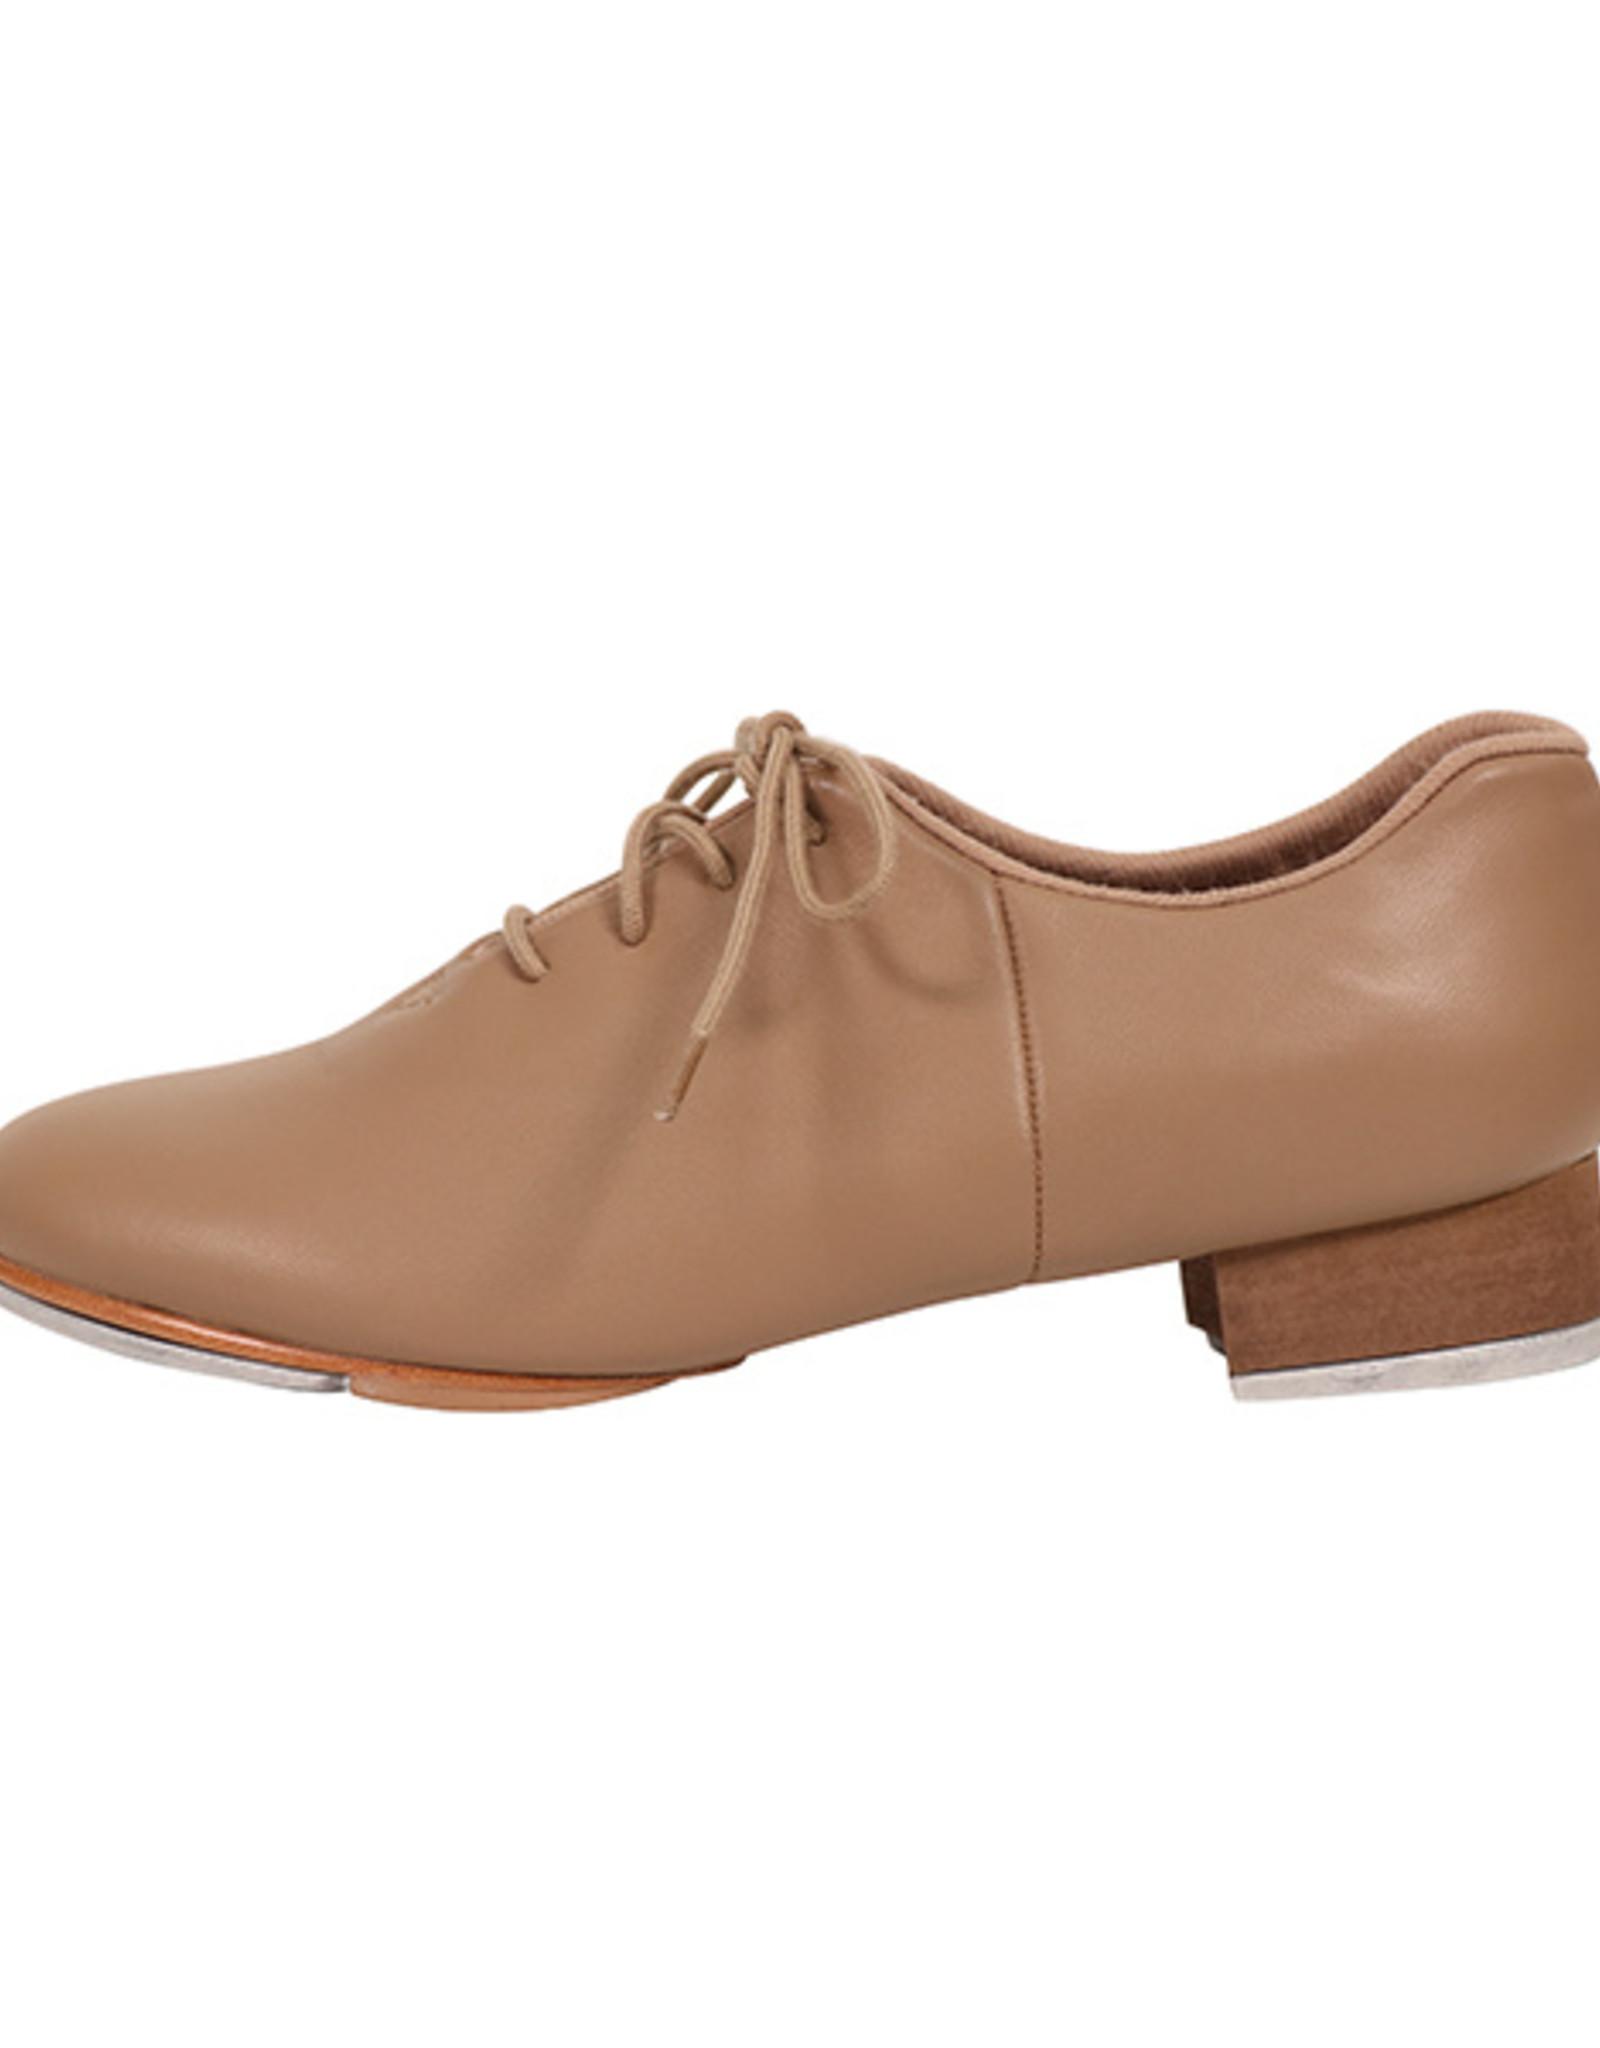 Eurotard Dancewear Eurotard Child Treble Split Sole Tap Shoe - A5524C